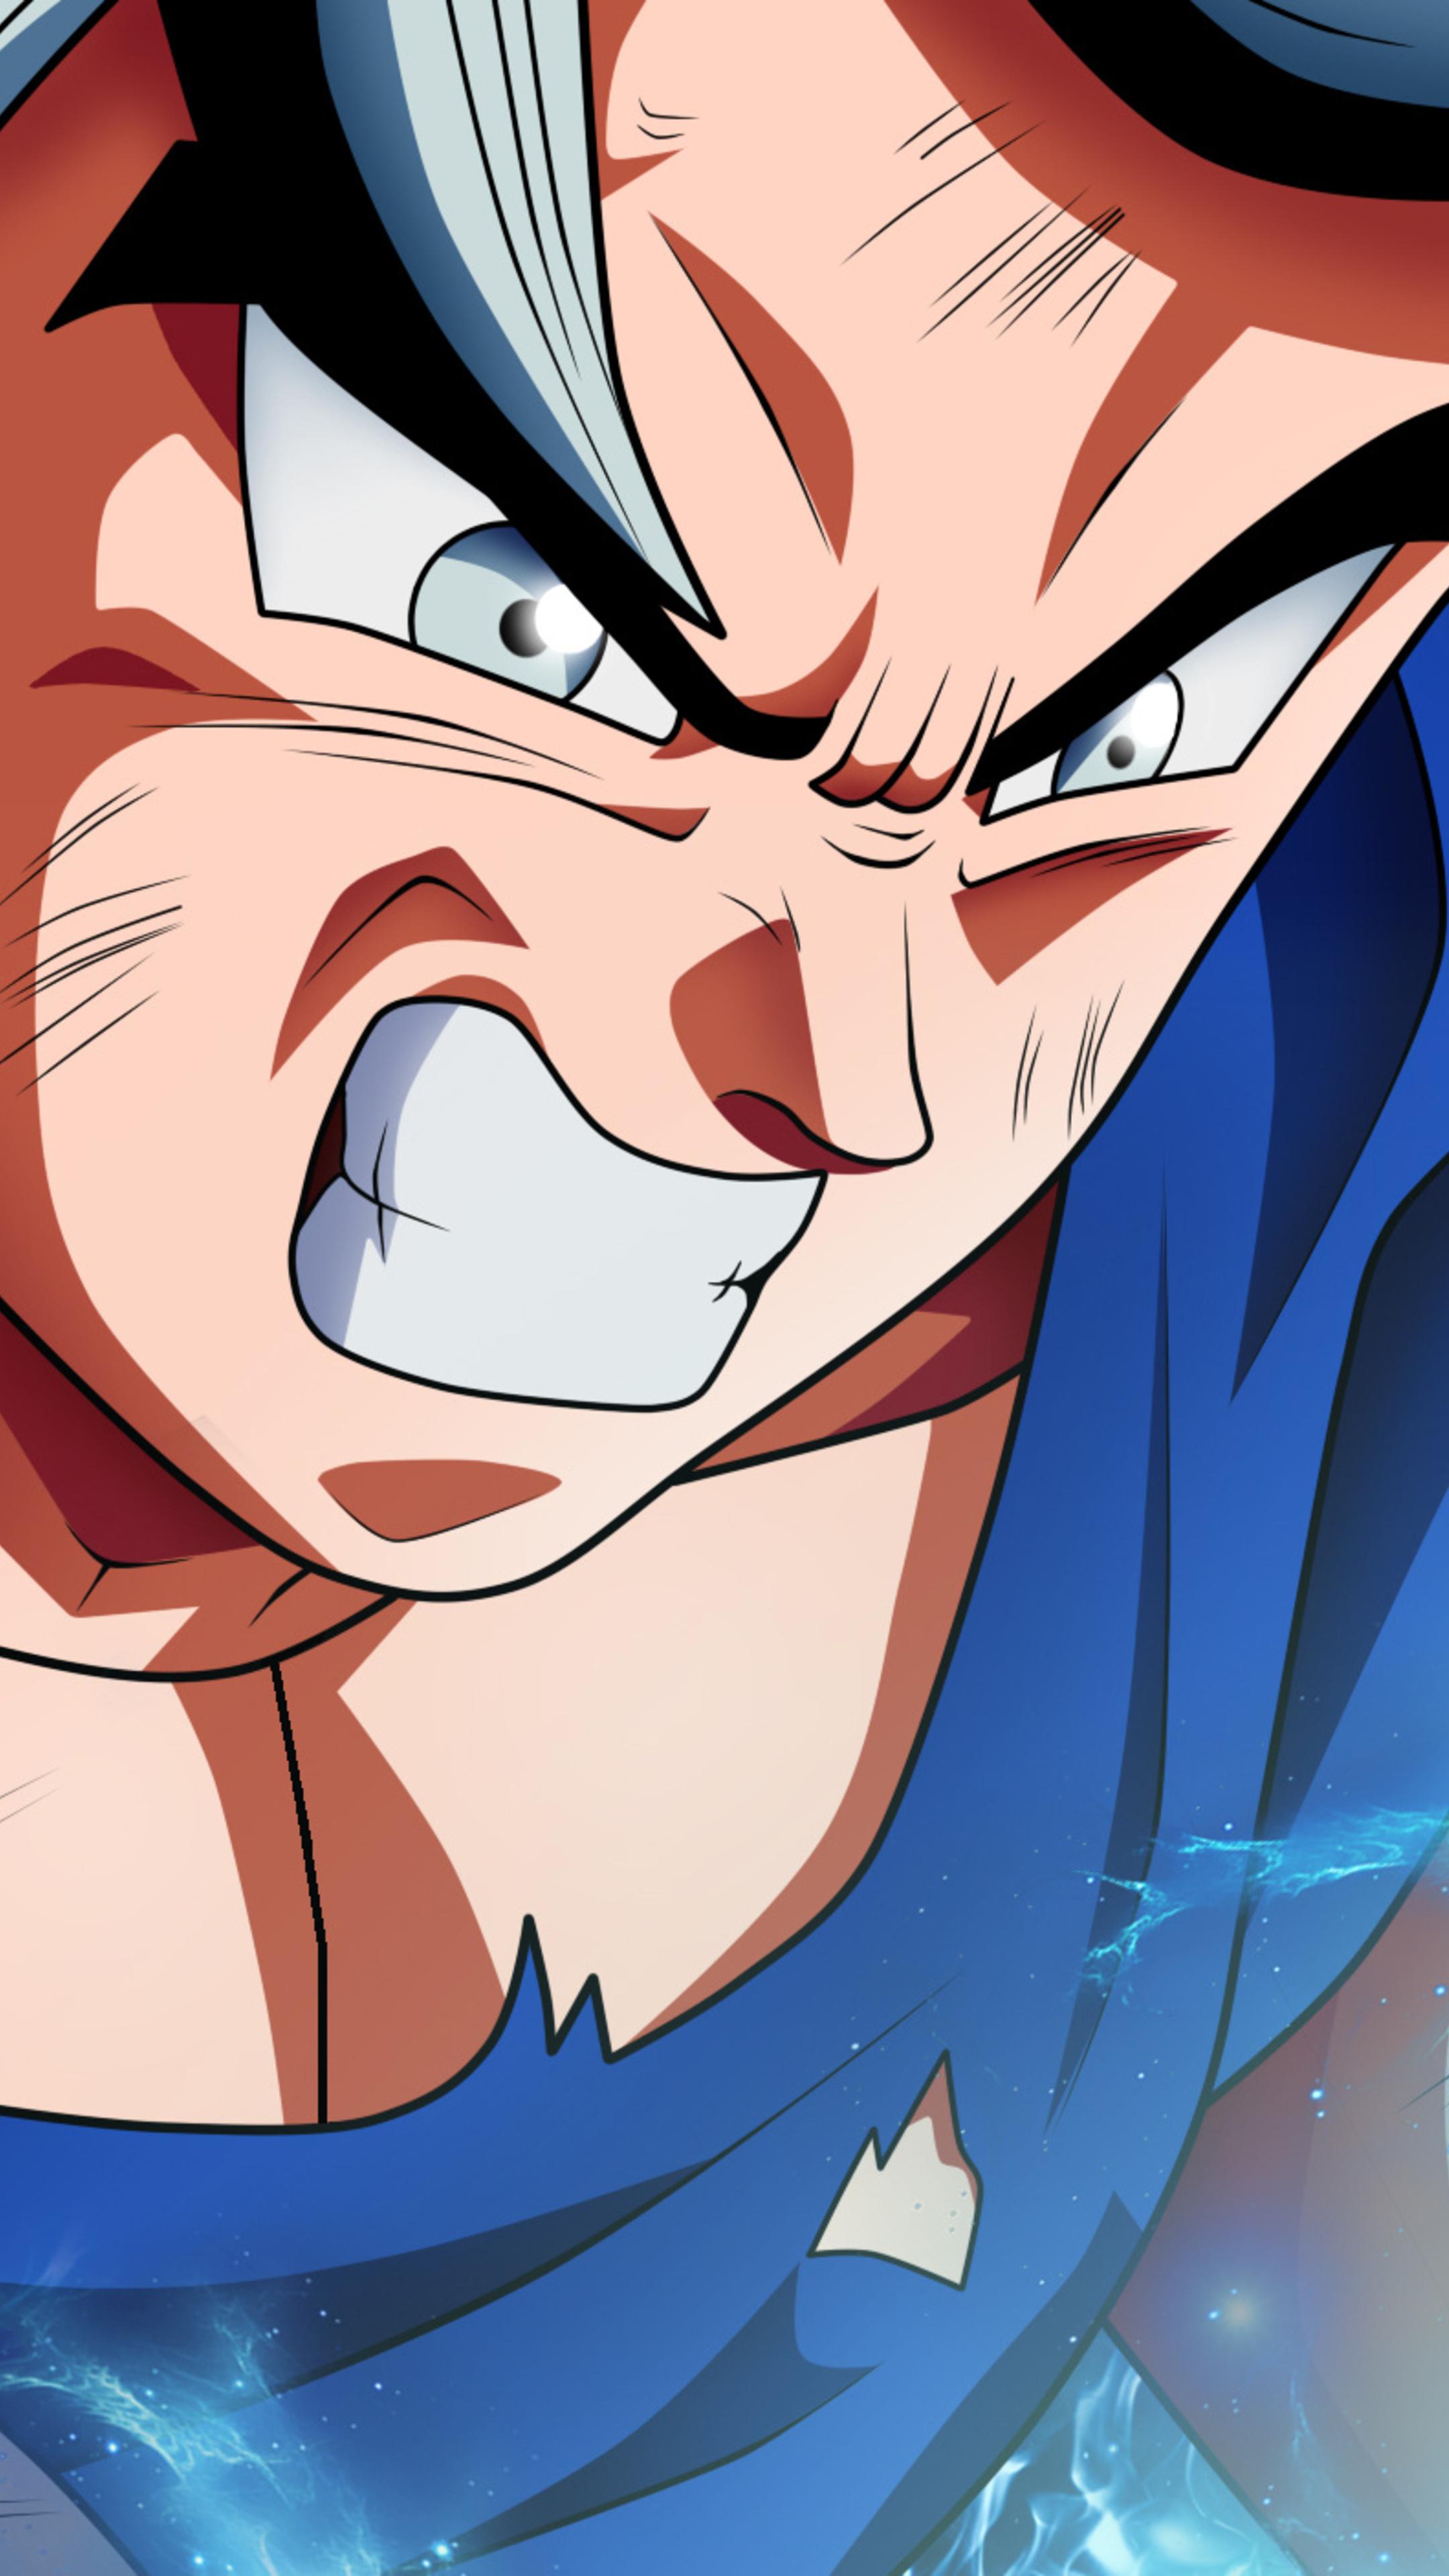 2160x3840 Goku Dragon Ball Super Anime HD 2018 Sony Xperia